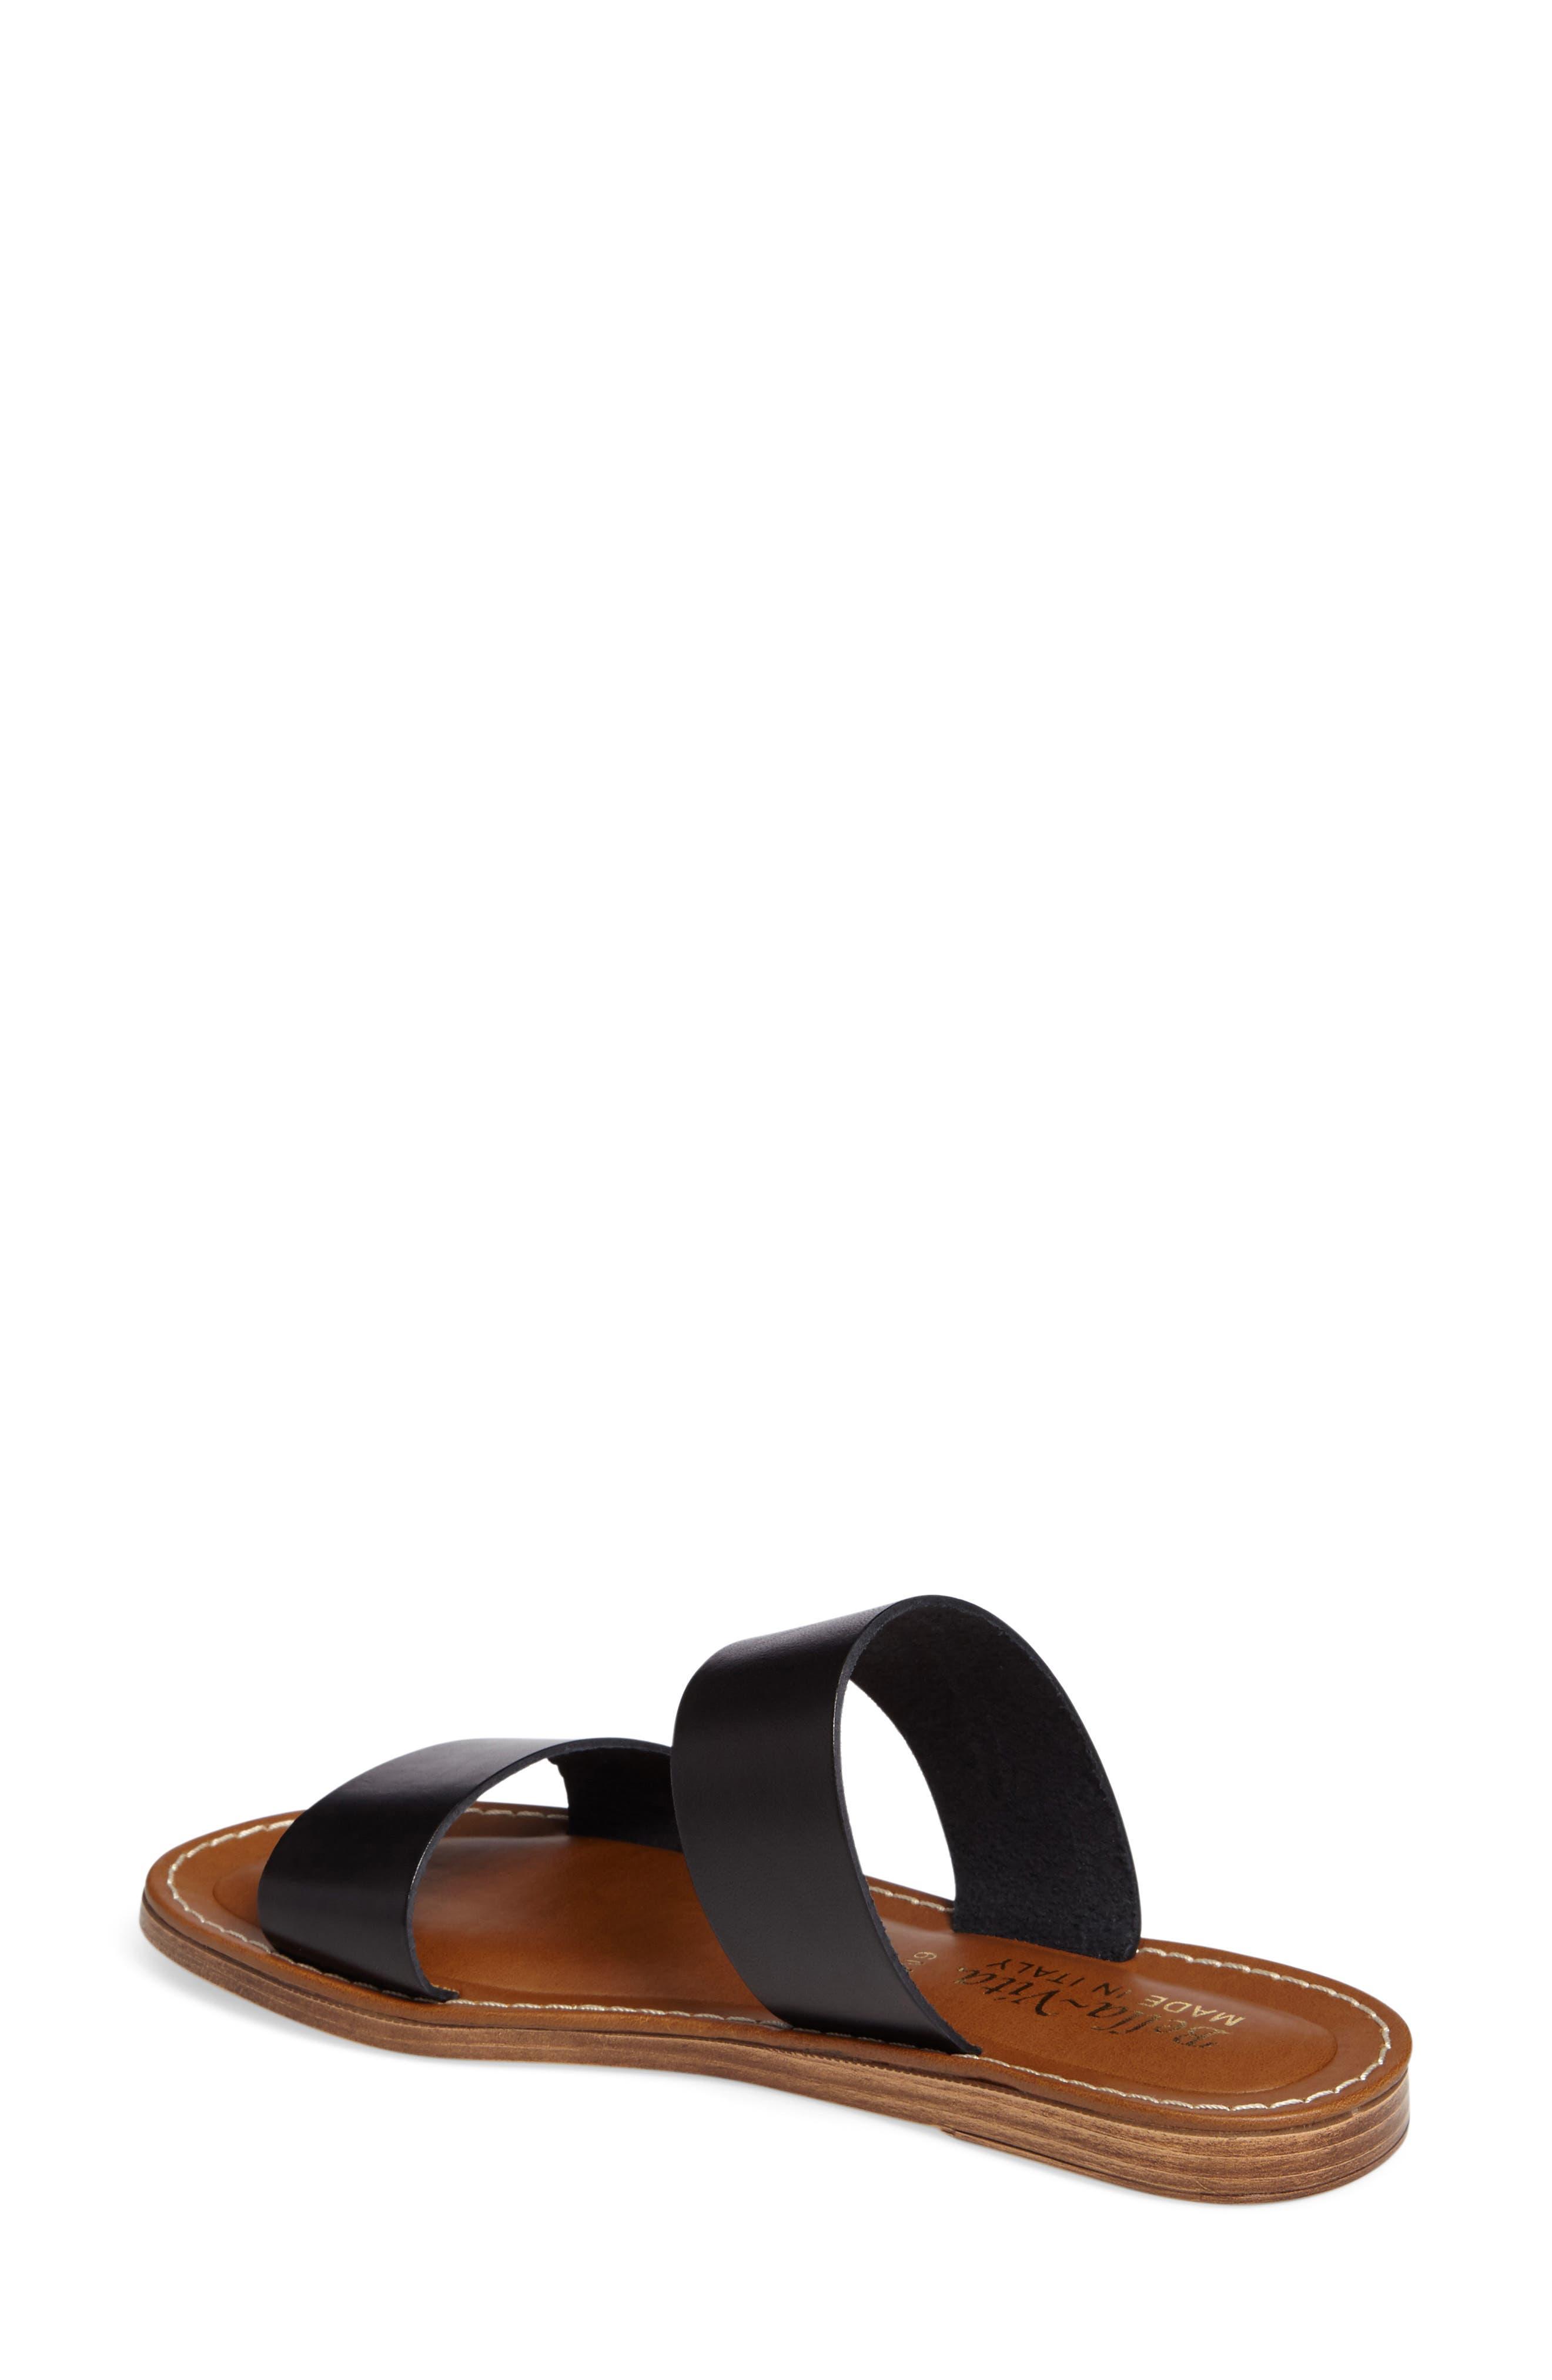 BELLA VITA, Imo Slide Sandal, Alternate thumbnail 2, color, BLACK LEATHER